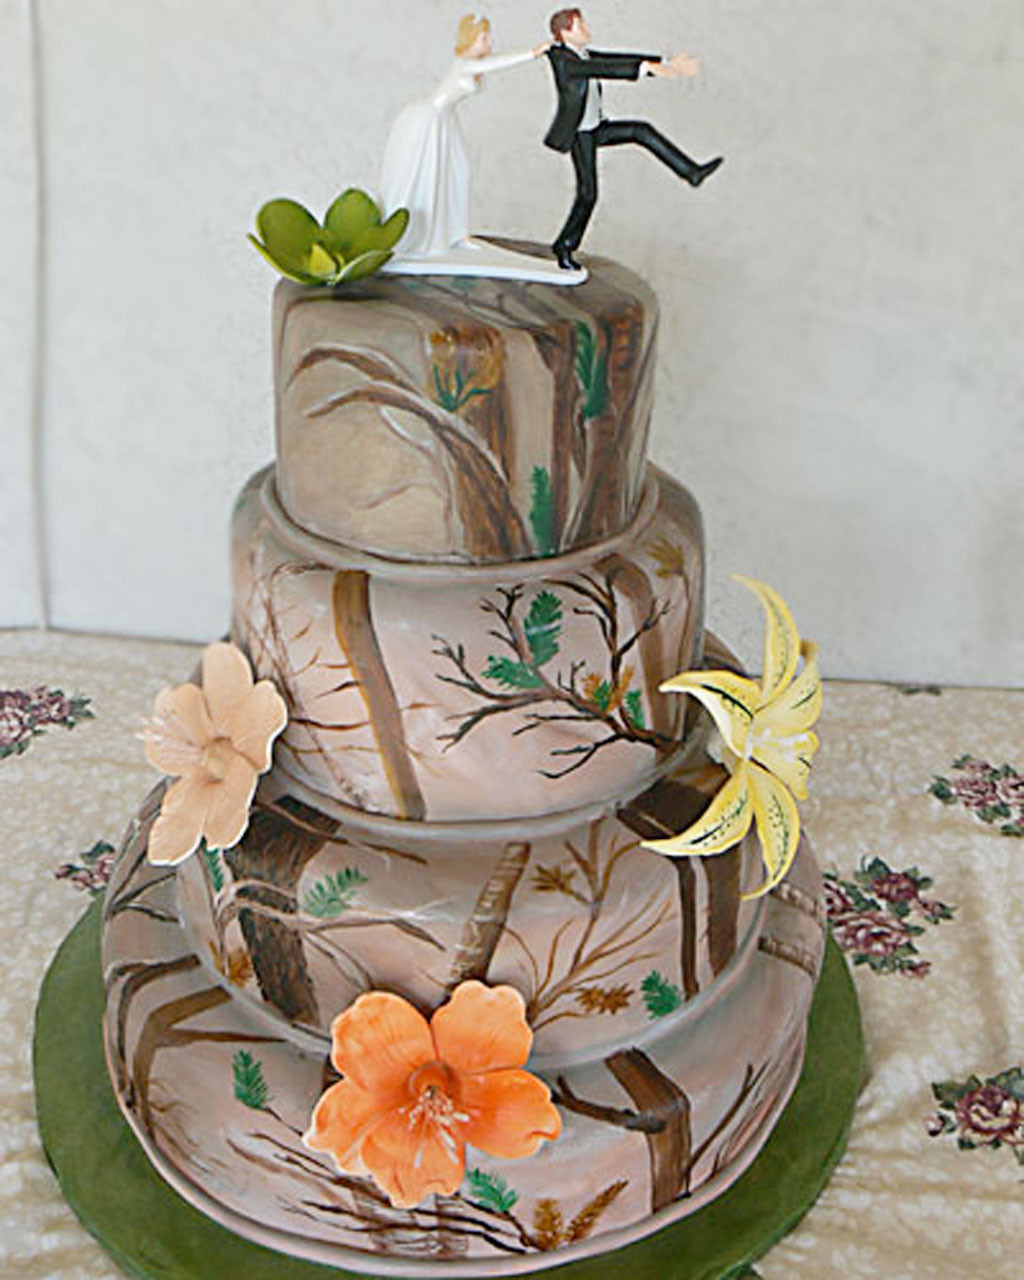 Wedding Cakes Camo  Camouflage Wedding Cake Ideas Wedding Cake Cake Ideas by